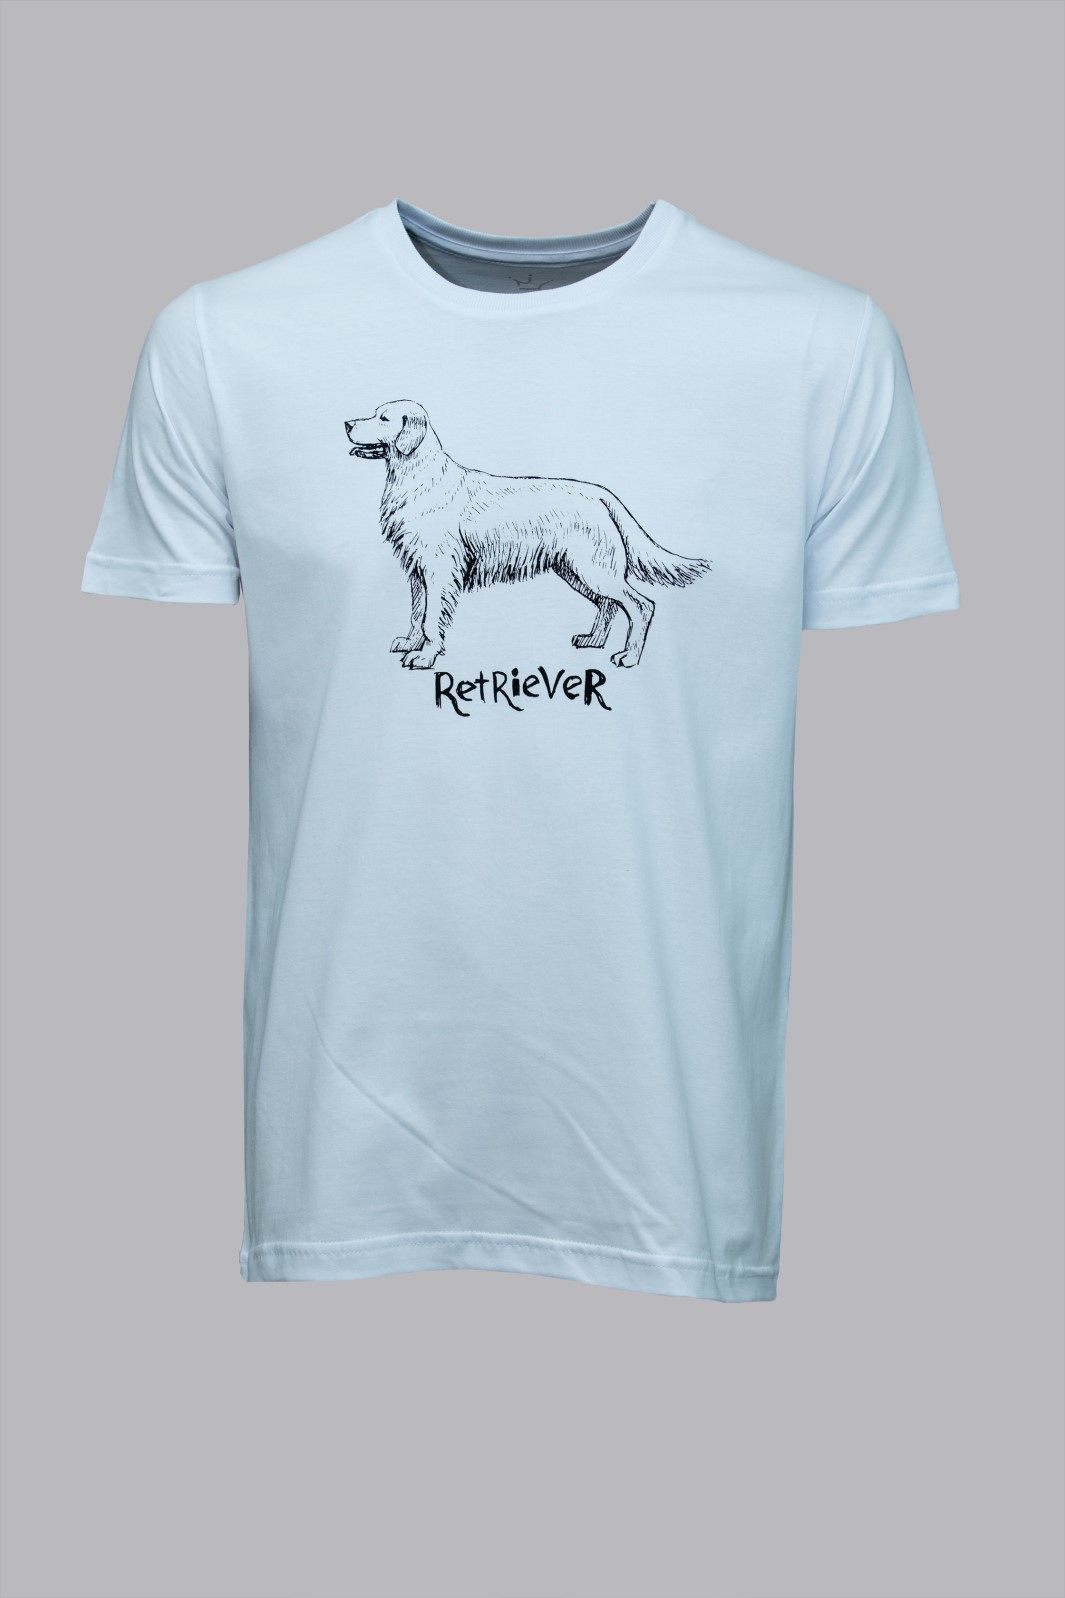 Camiseta CoolWave Retriever